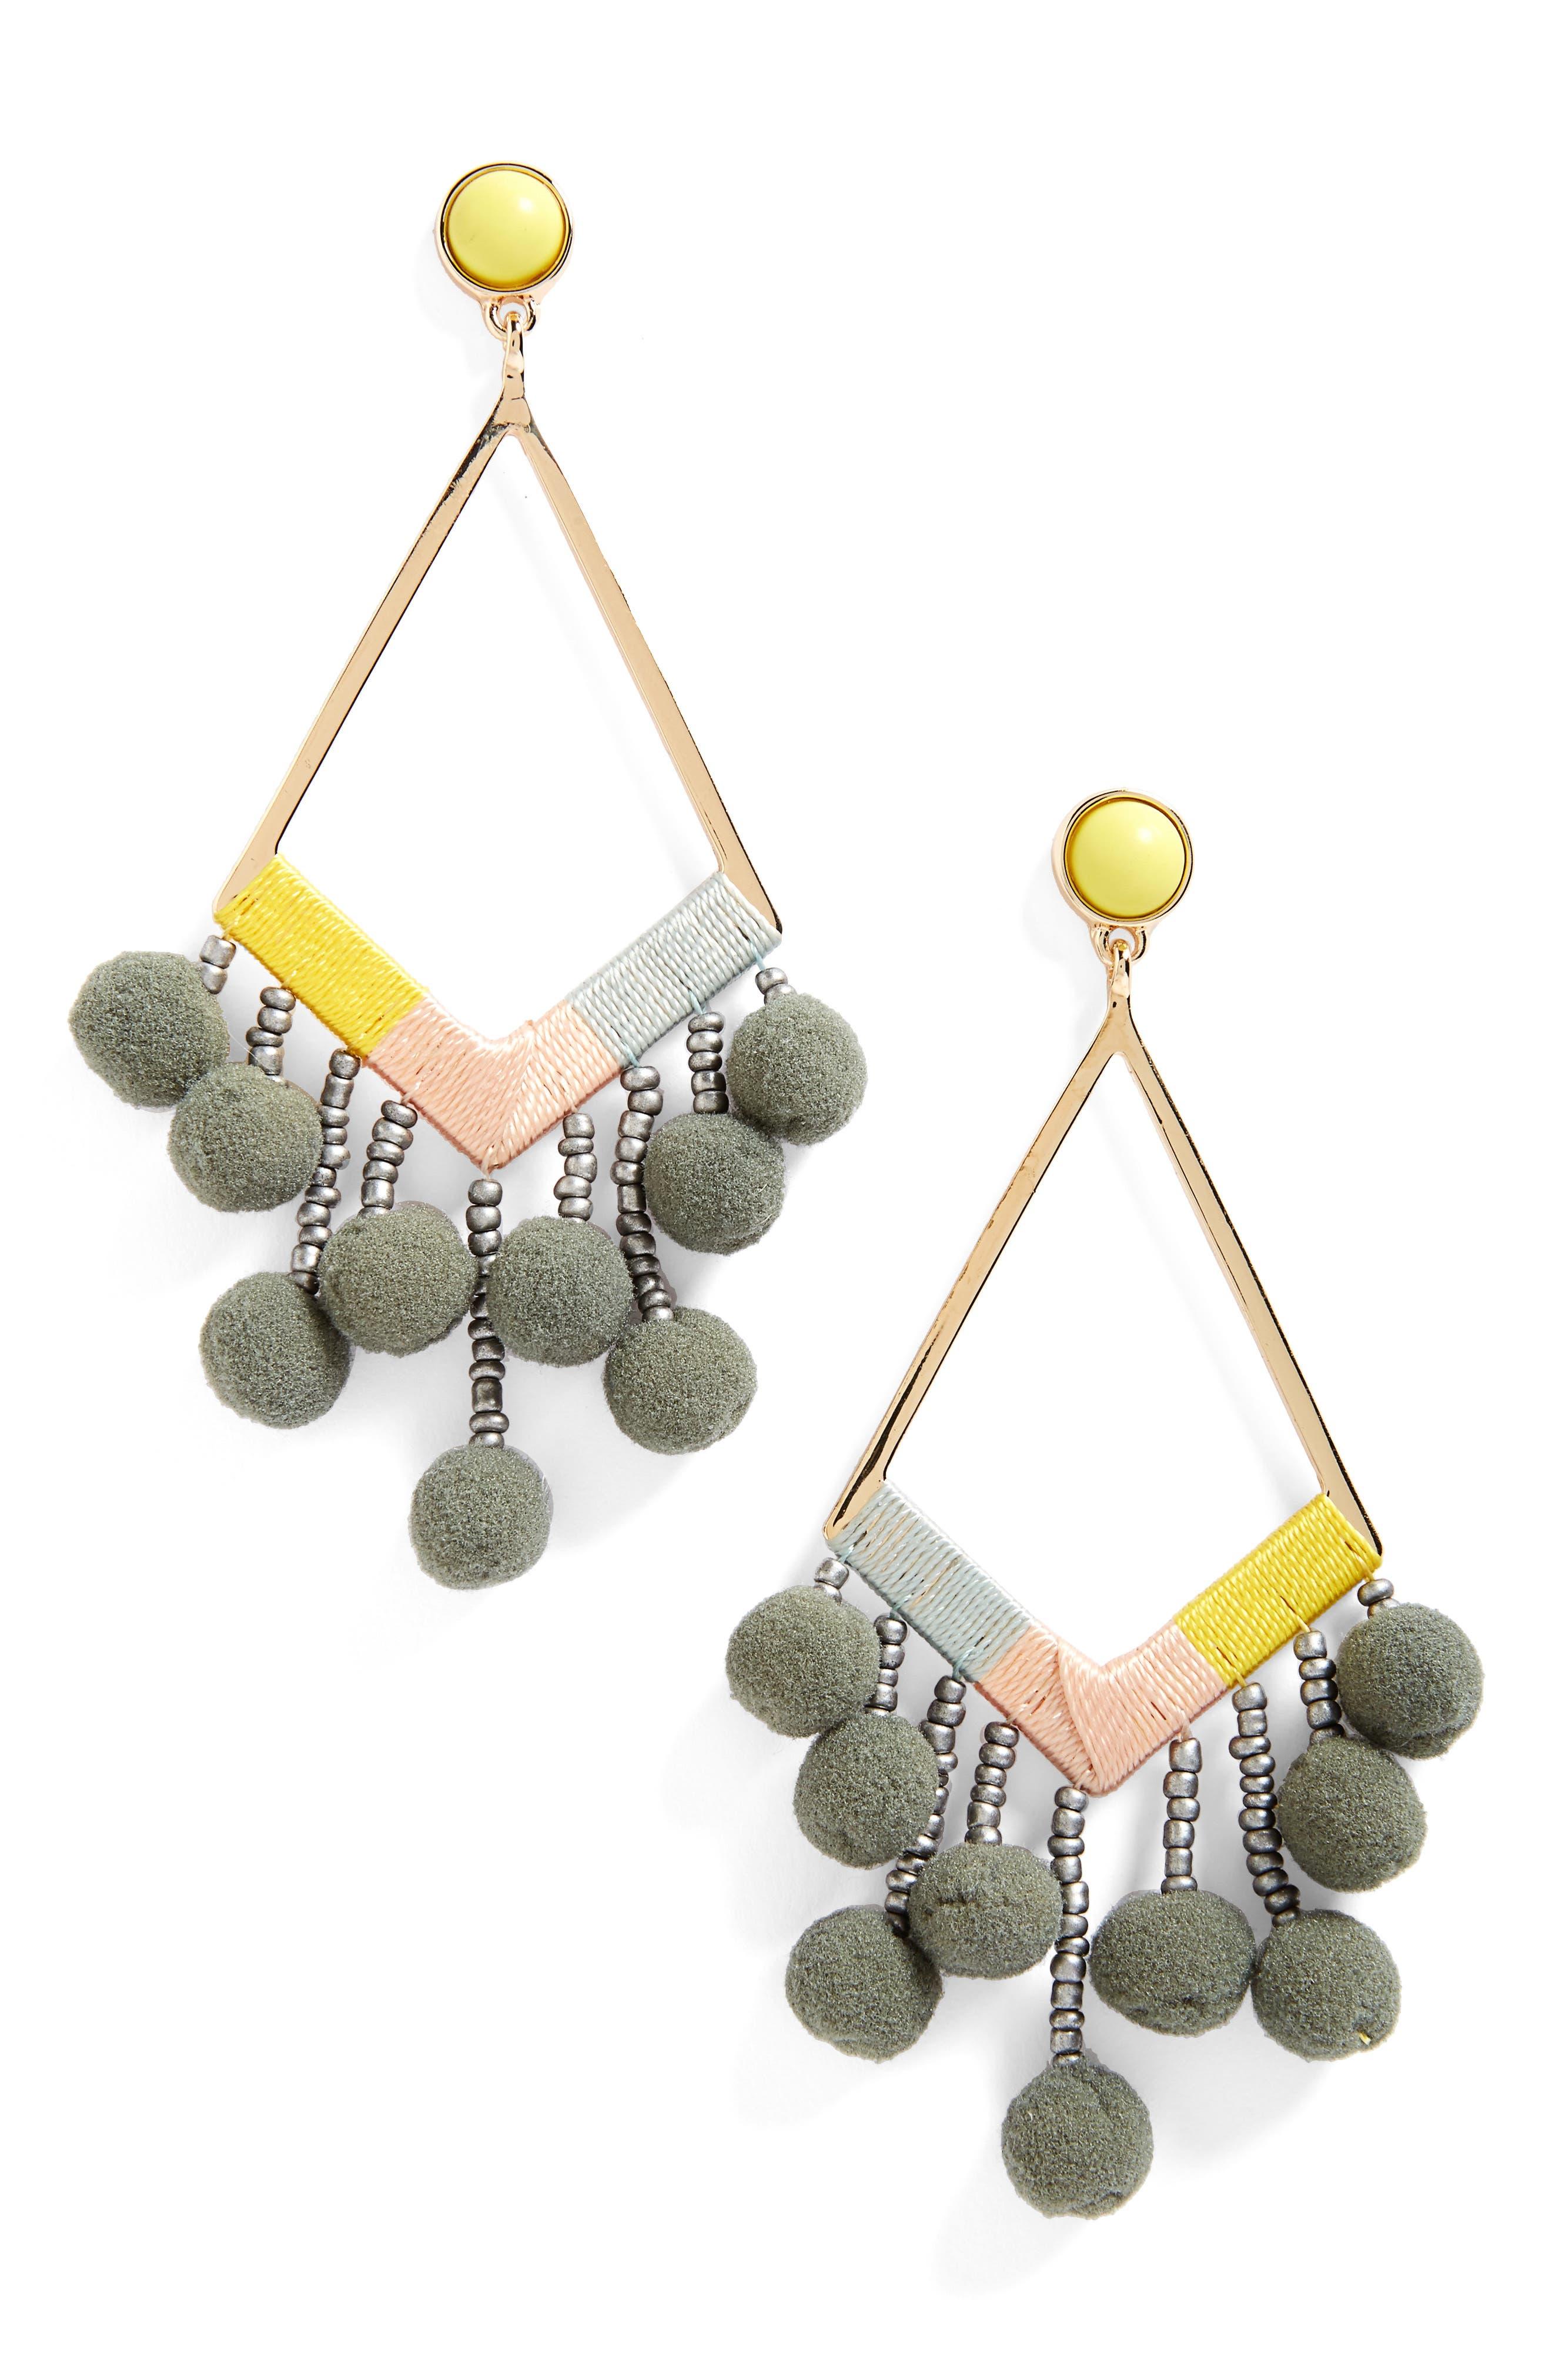 BAUBLEBAR, Geo Drop Earrings, Main thumbnail 1, color, 021